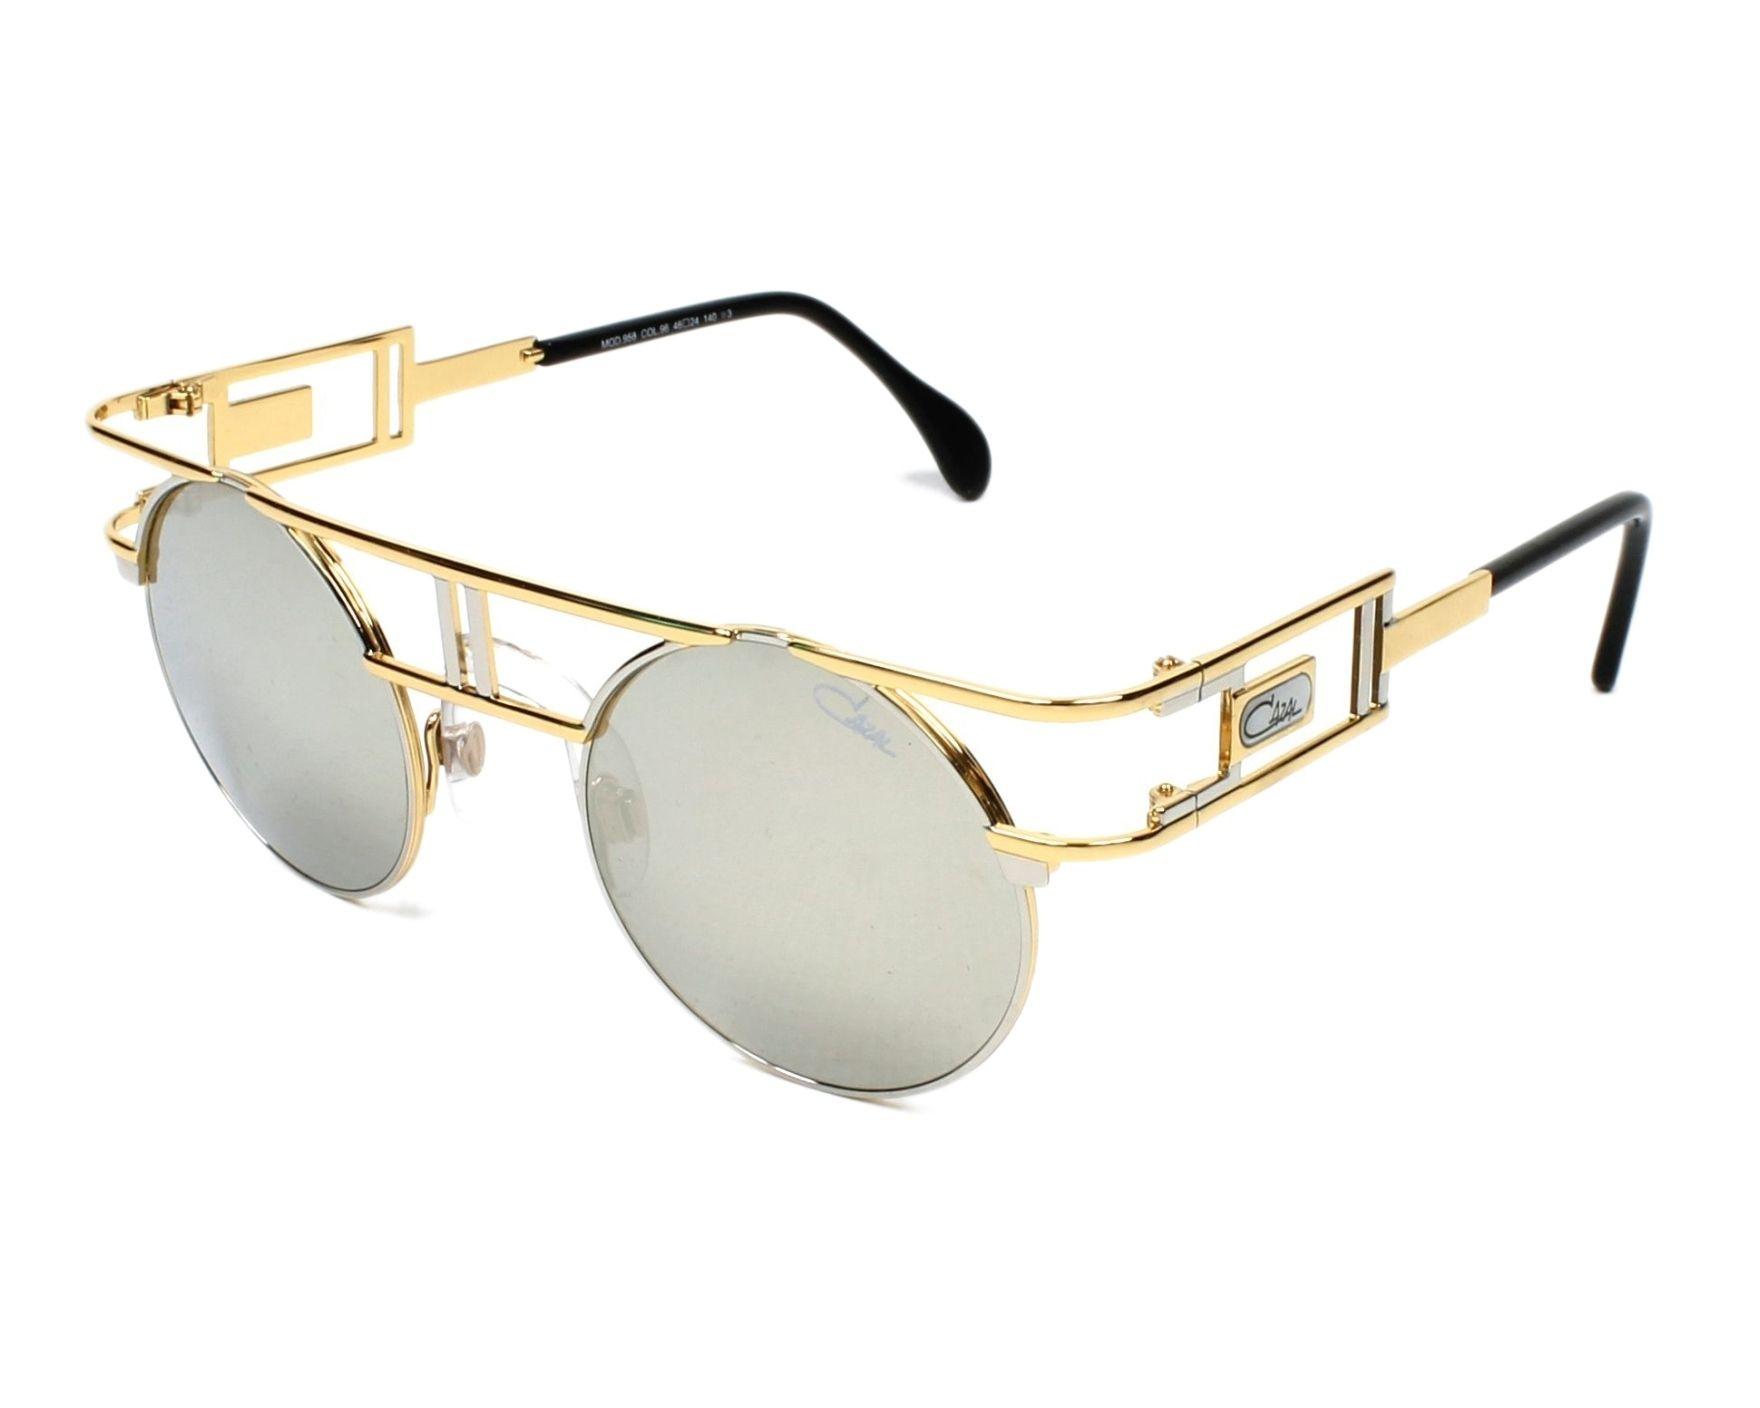 0d8aca74c39 Sunglasses Cazal 958 096 46-24 Gold profile view